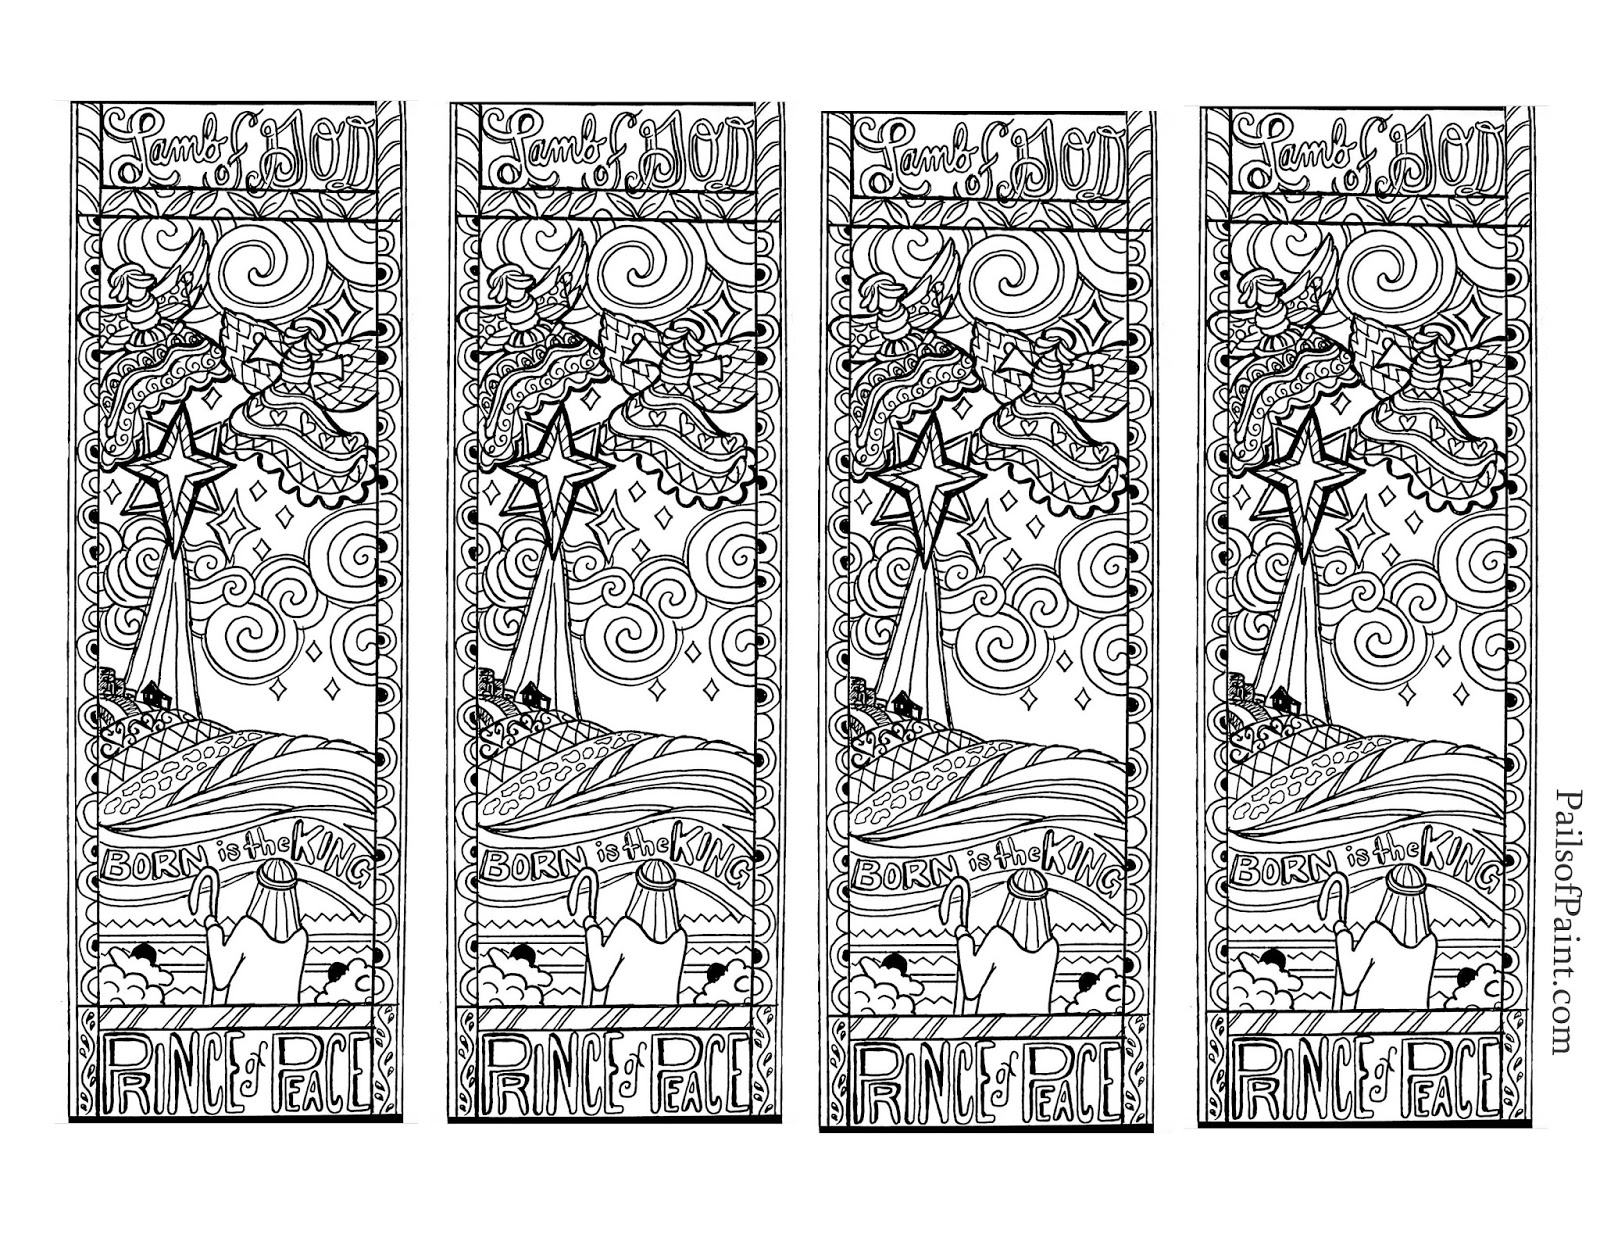 Free Printable Bookmarks To Color For Christmas